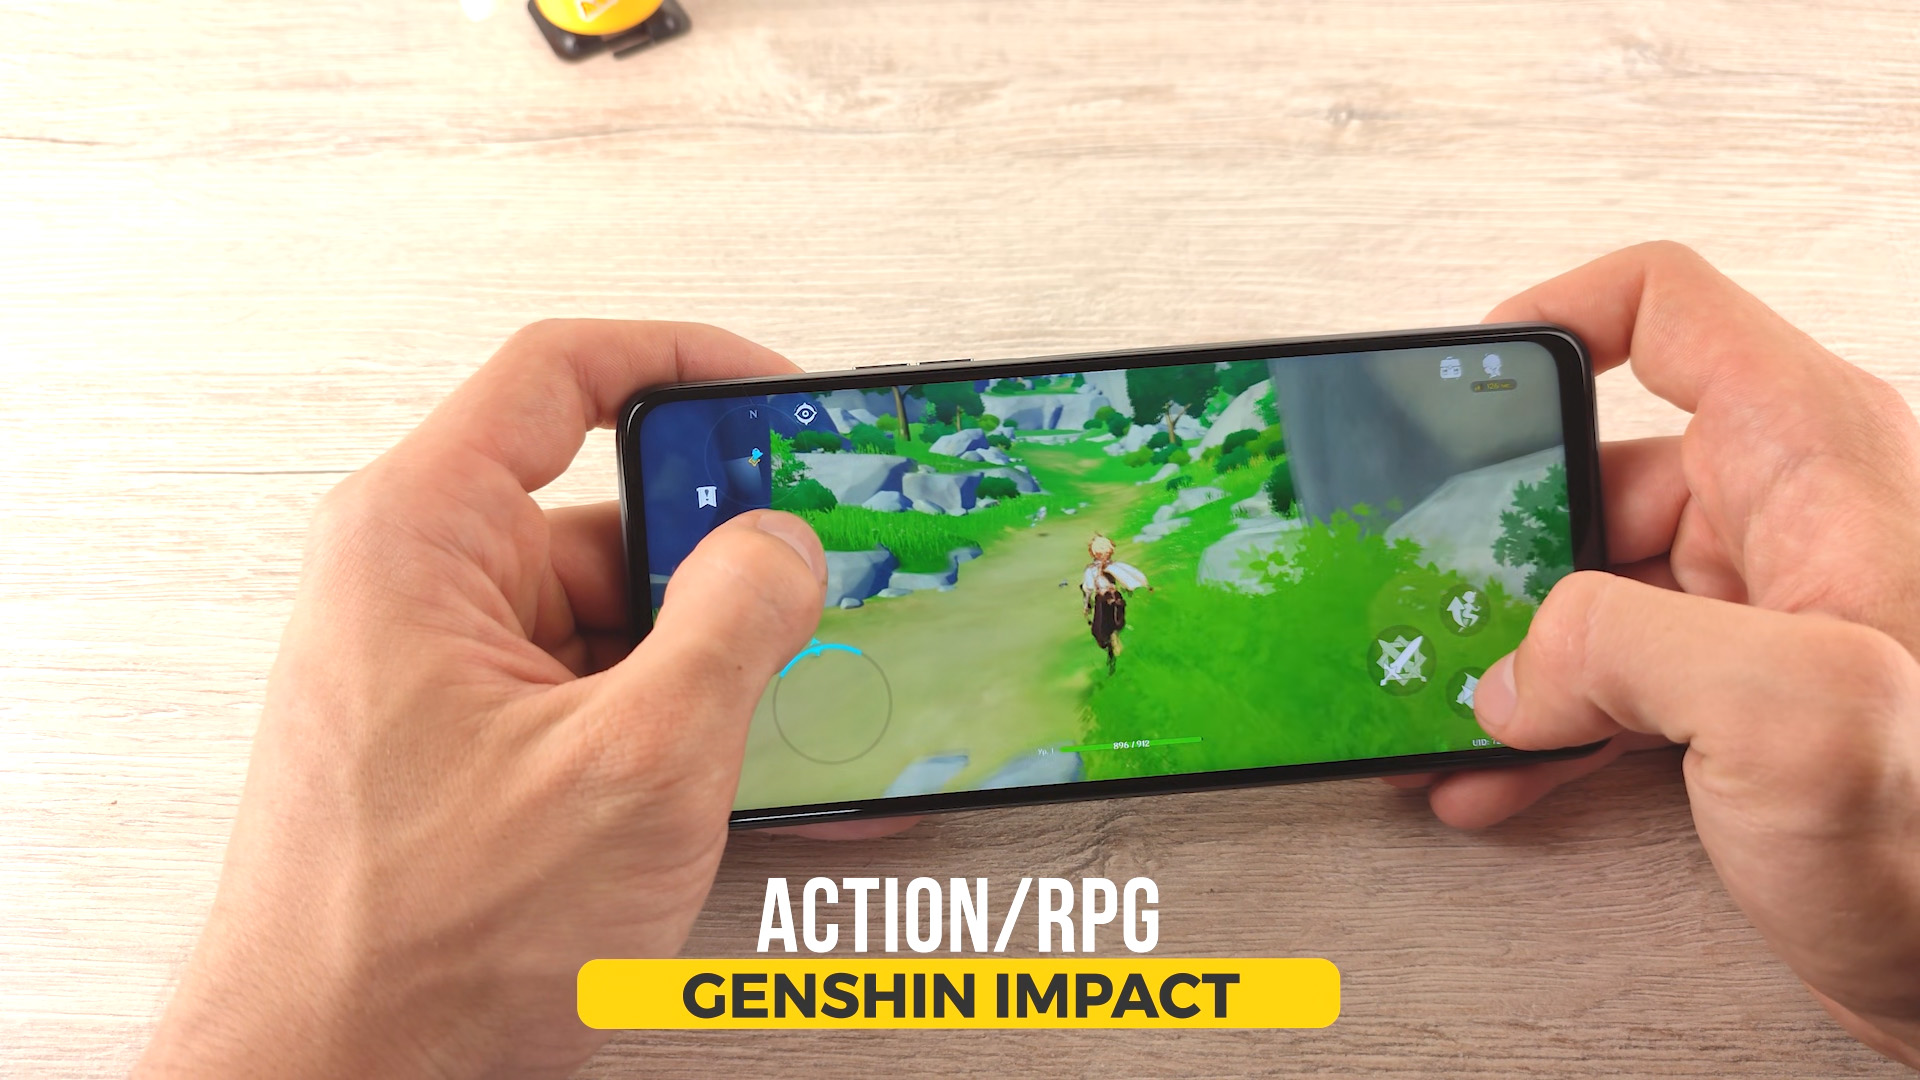 Tecno Camon 17P геймплей gameplay genshin impact геншин импакт